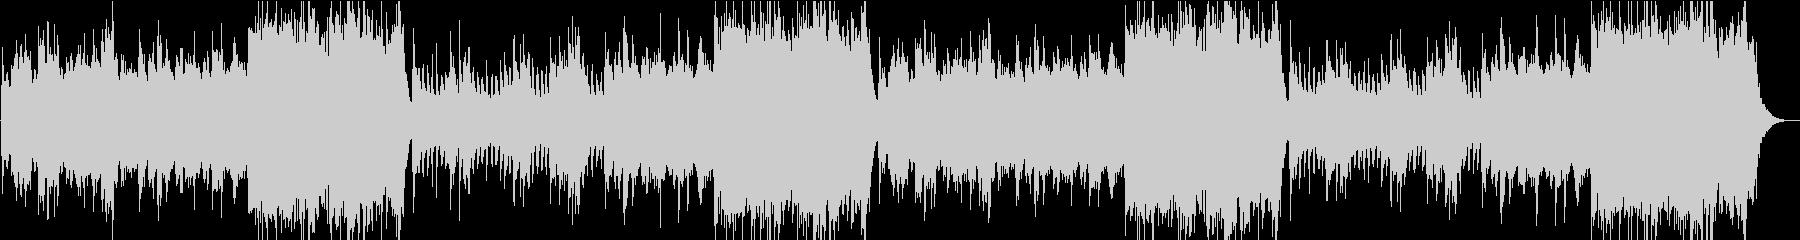 Ombra mai fu music box orchestra's unreproduced waveform